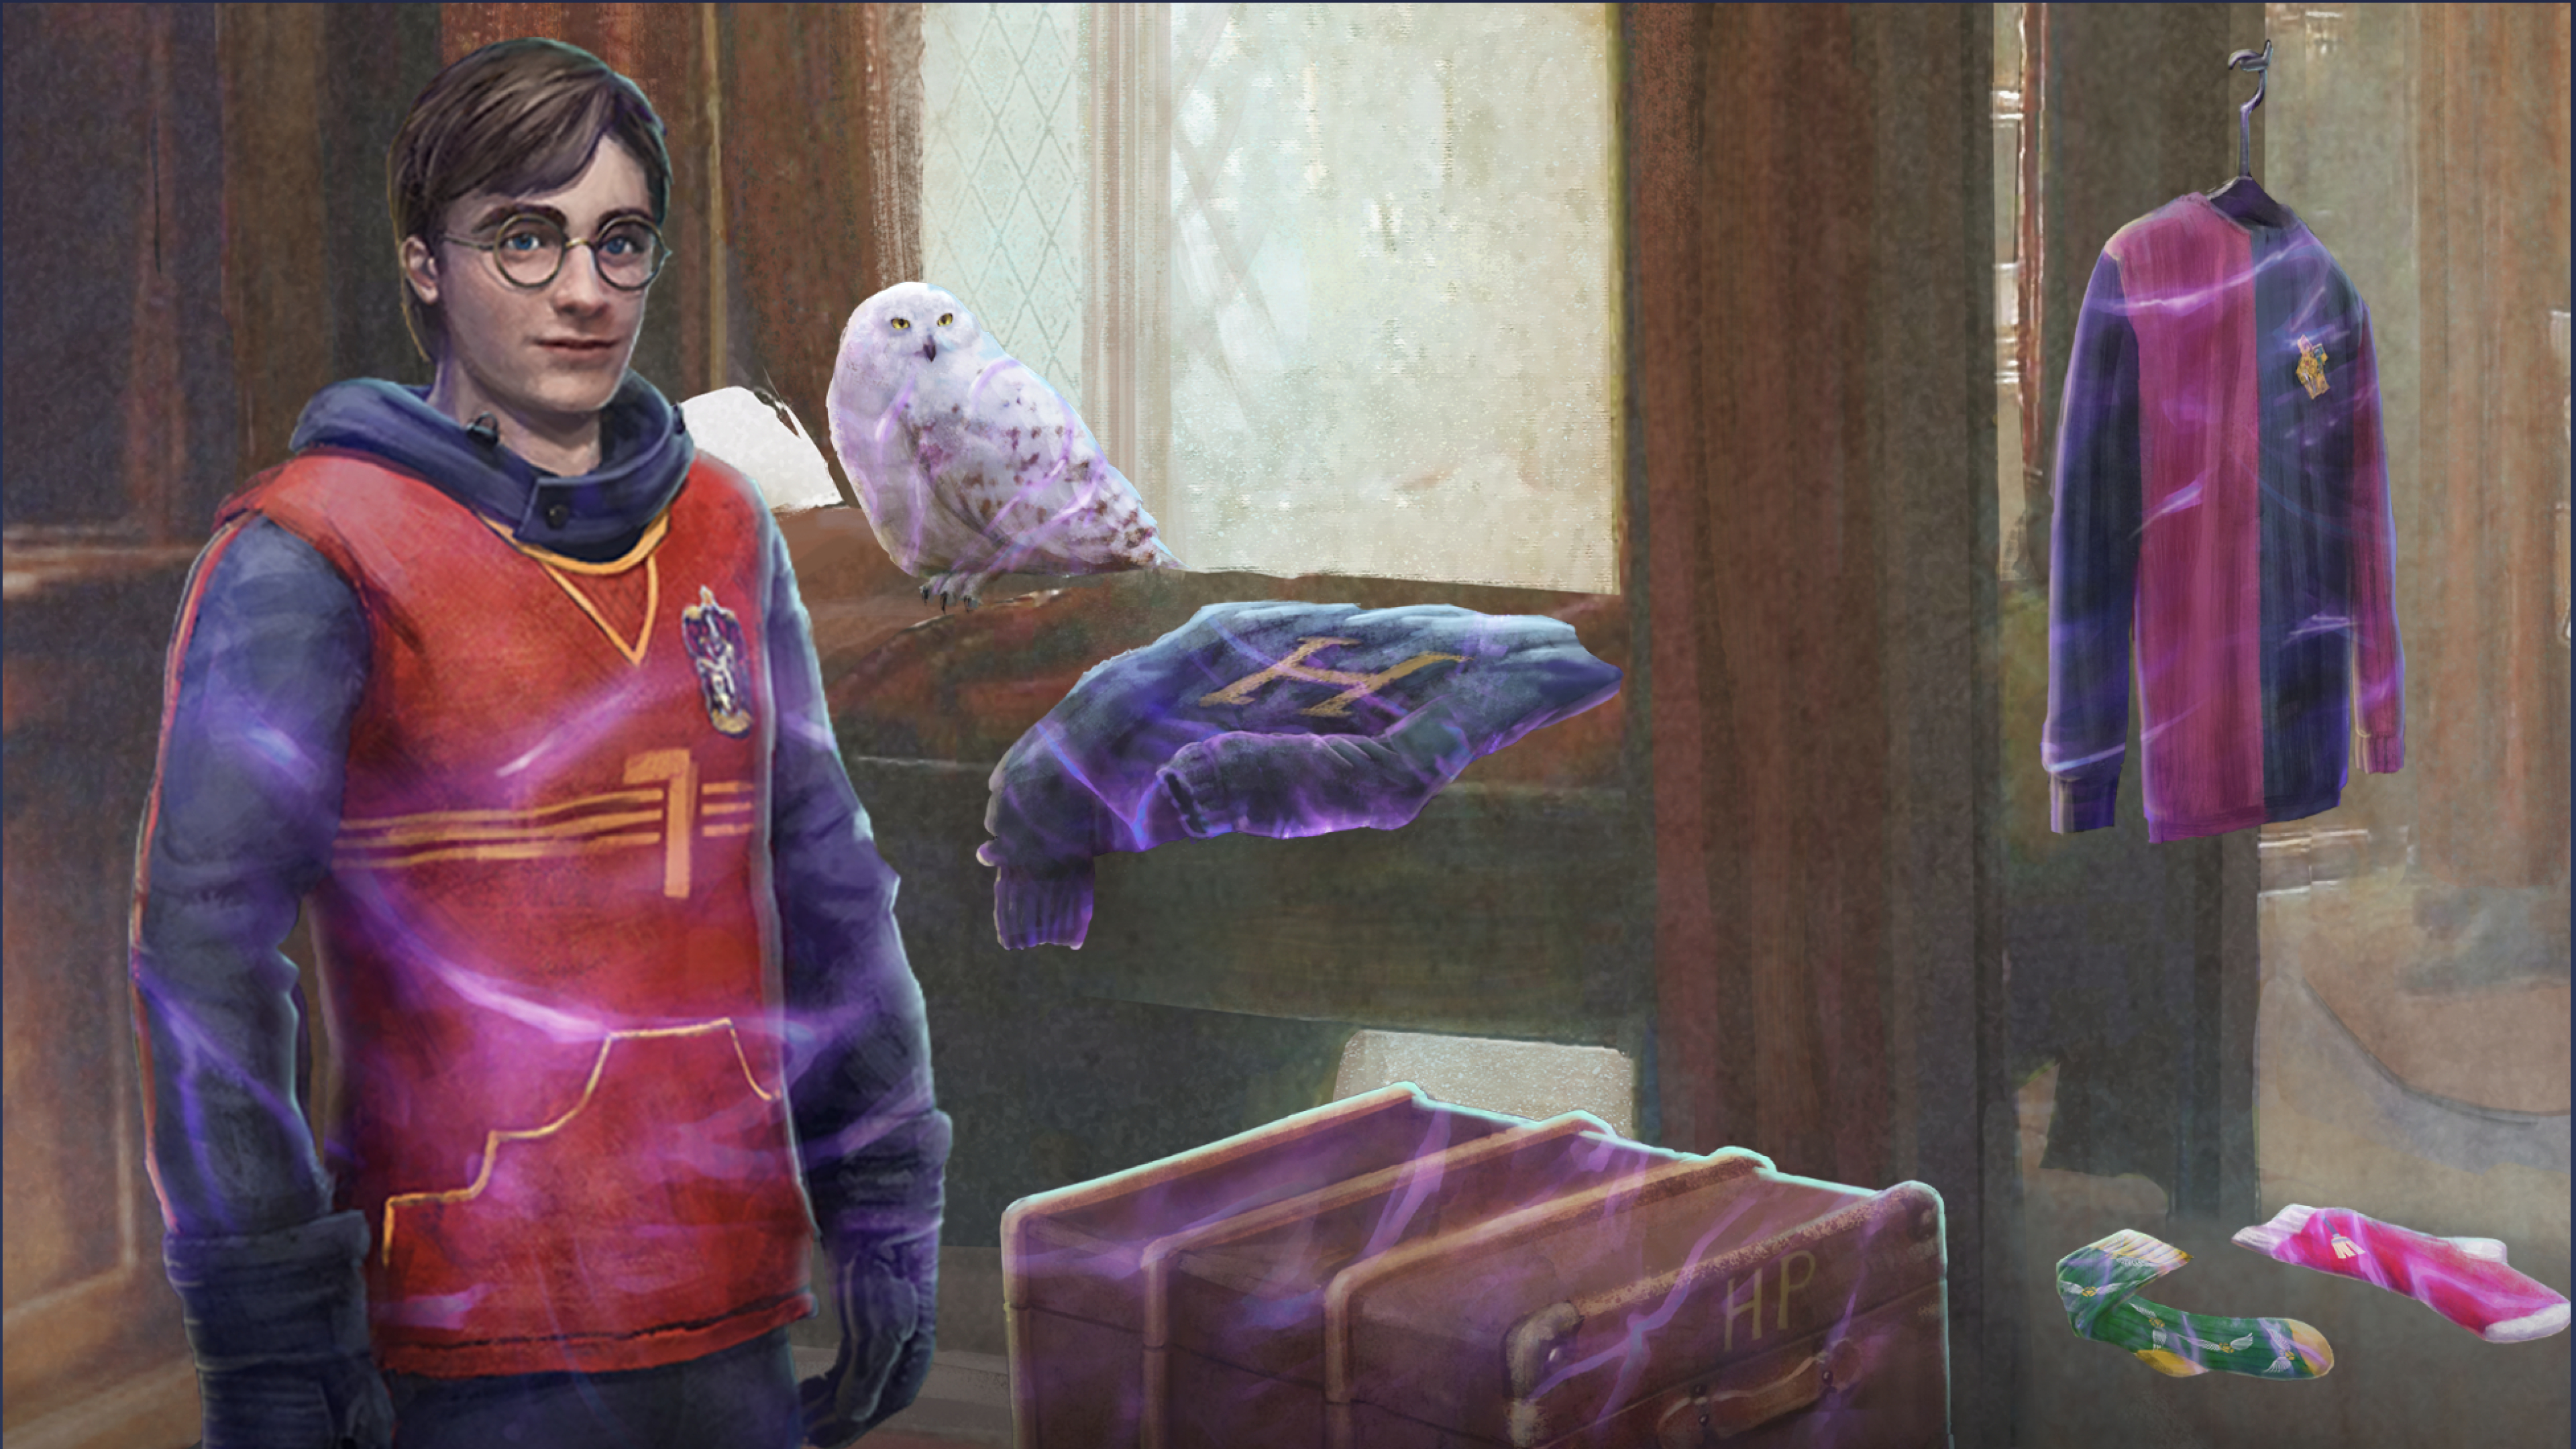 3840x2160 Harry Potter Wizards Unite 4K Wallpaper, HD ...